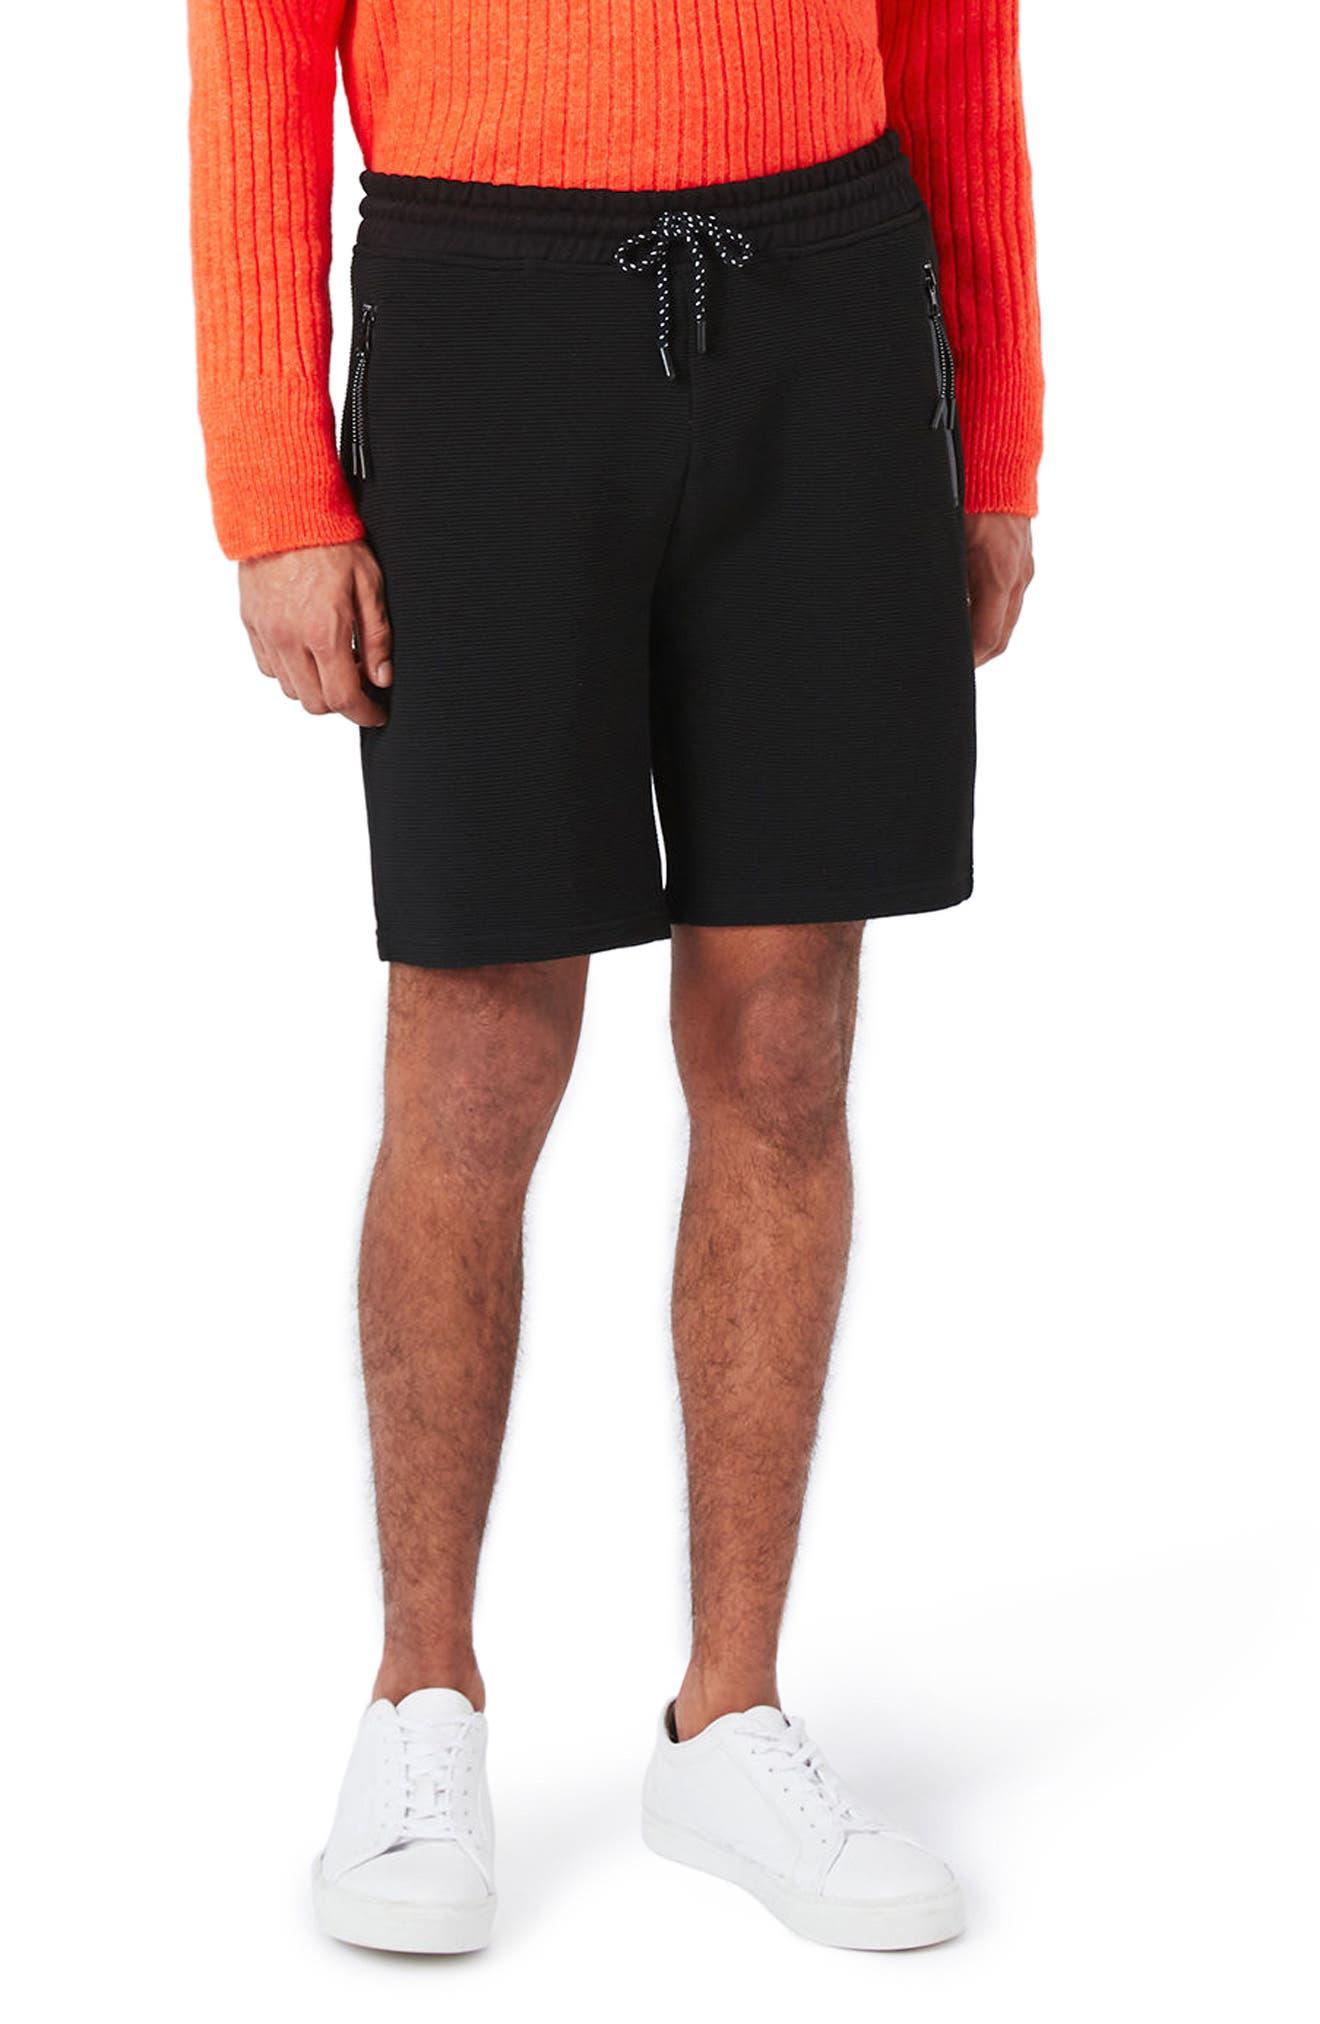 Topman Textured Jersey Shorts